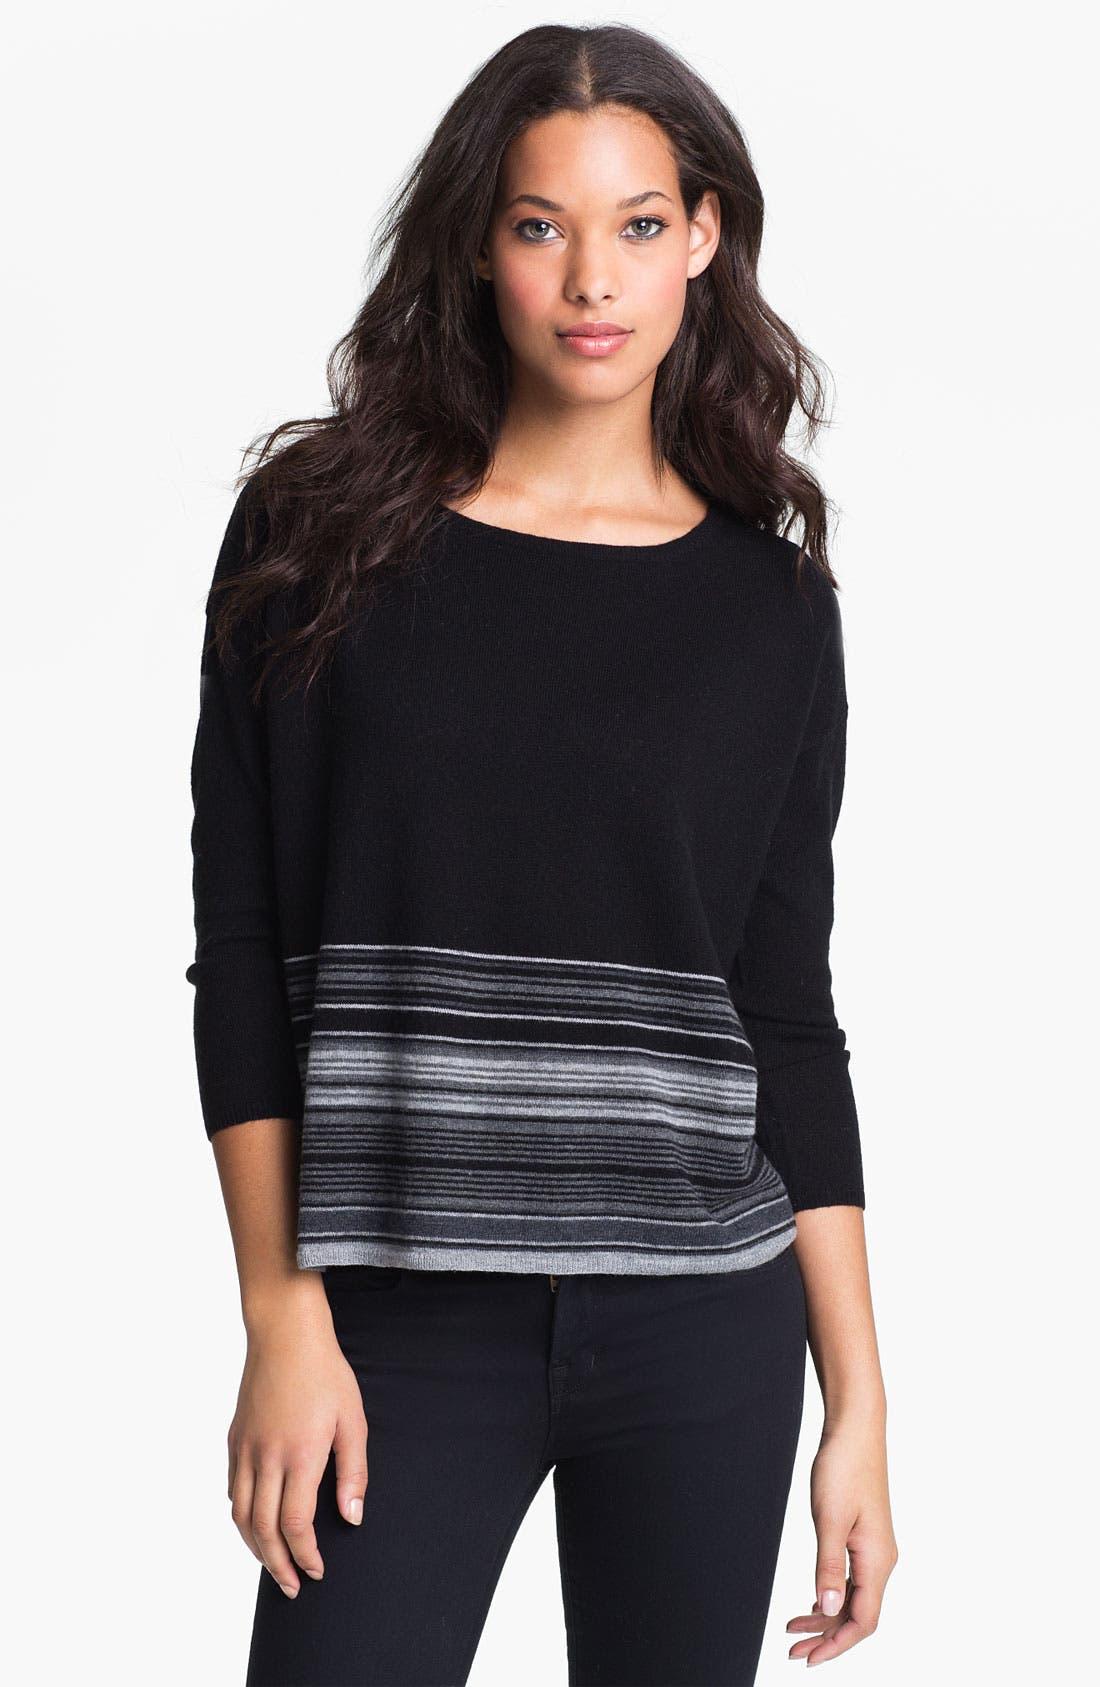 Alternate Image 1 Selected - Joie 'Zed' Boxy Sweater